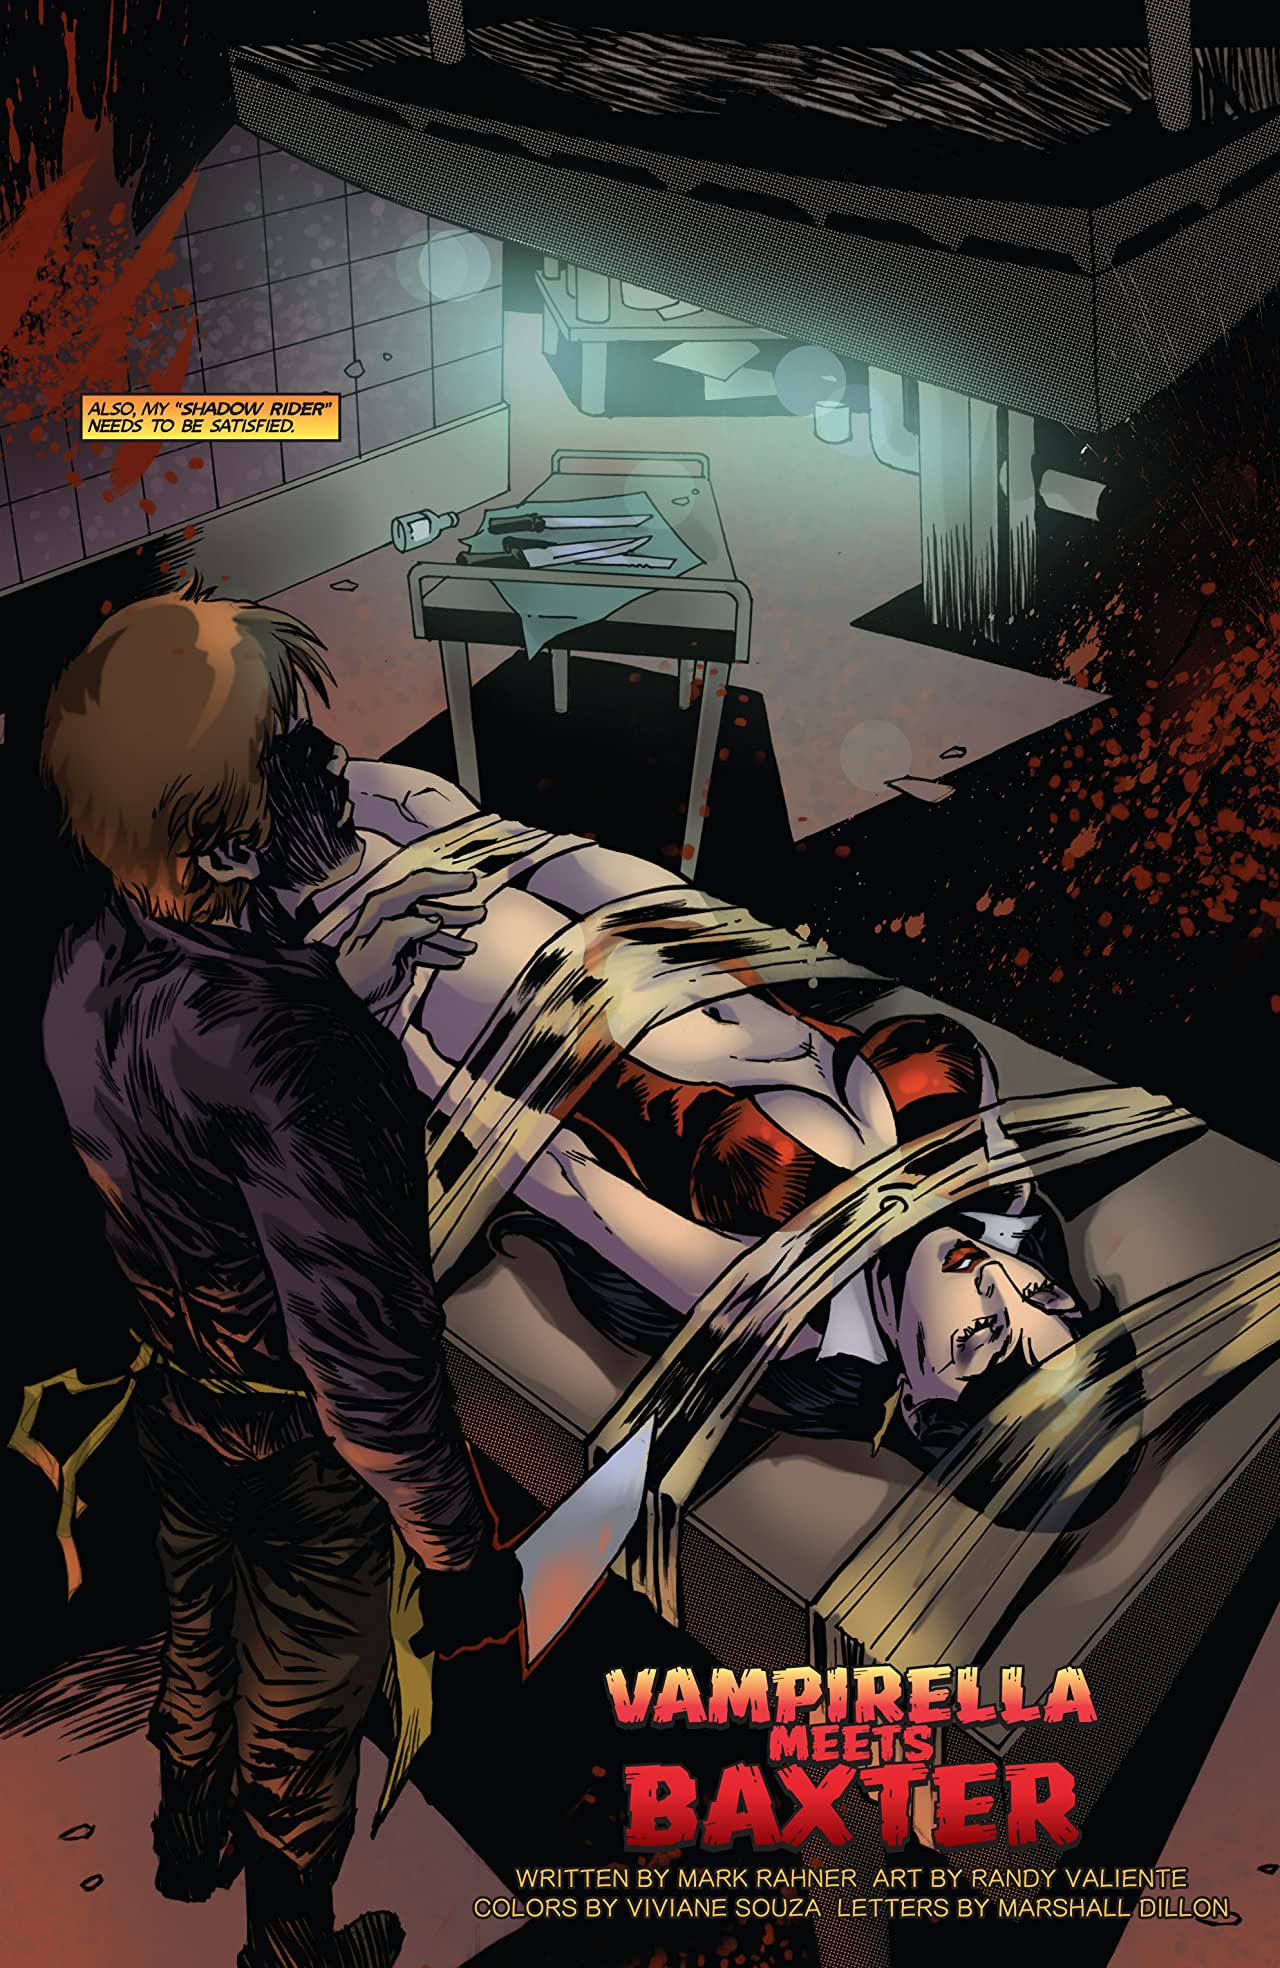 Vampirella Annual 2013 #3